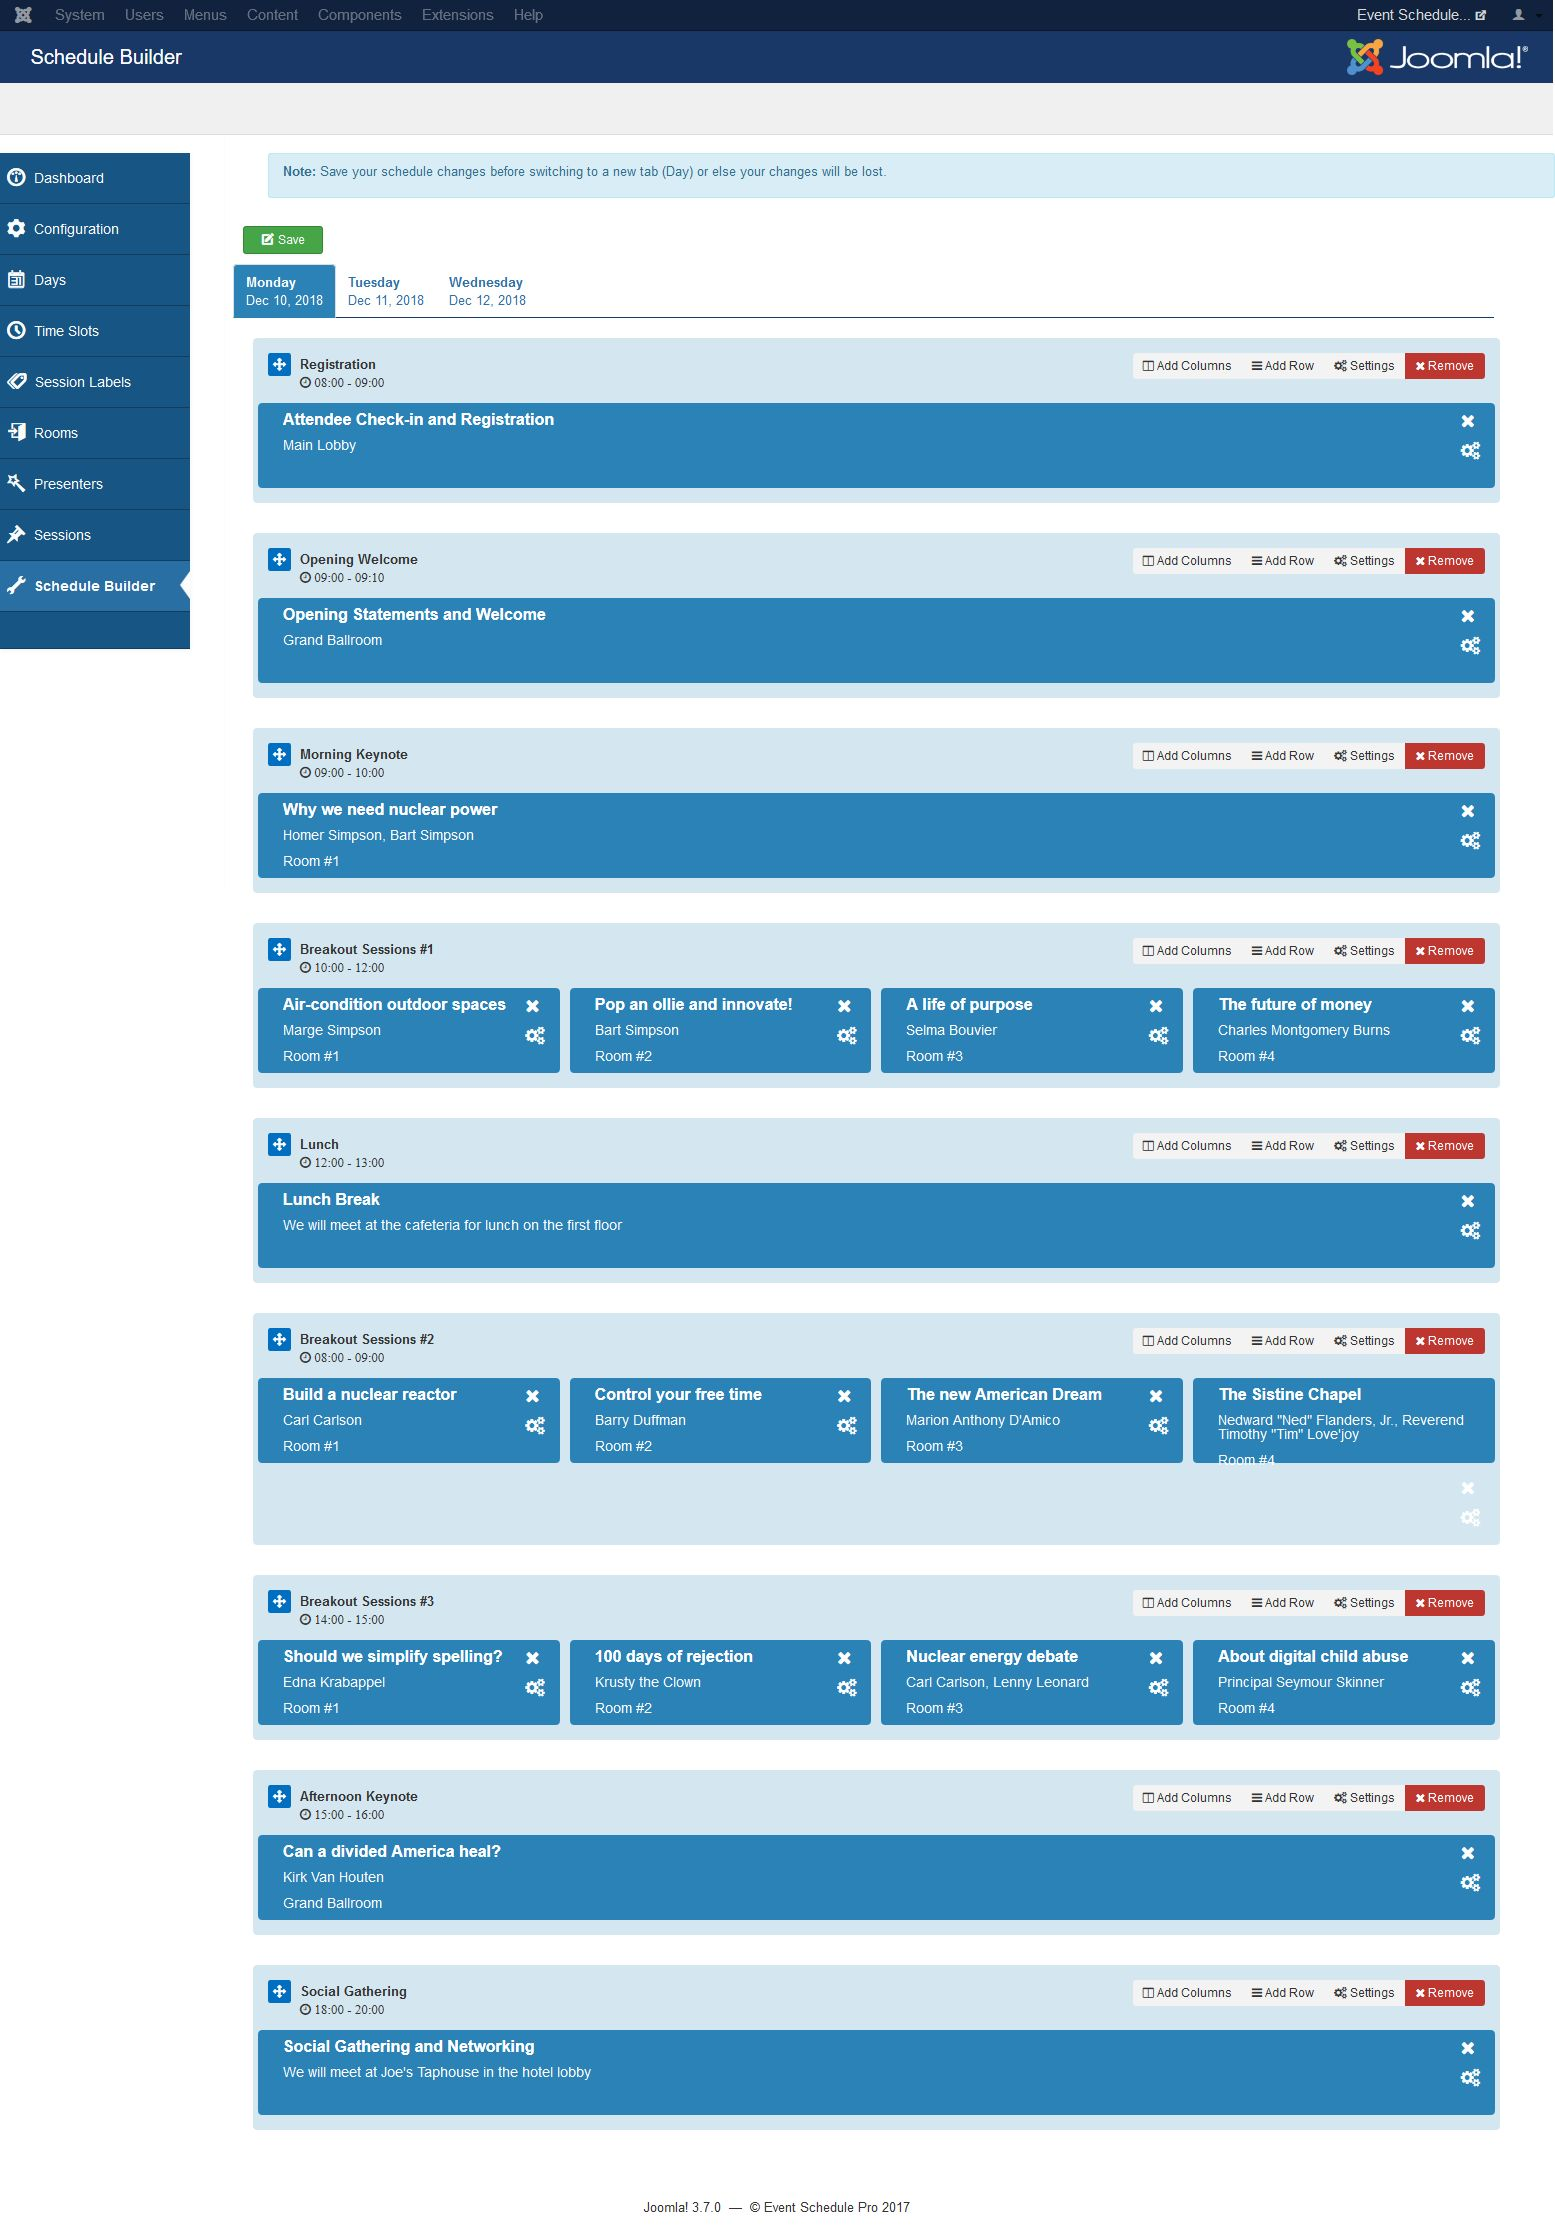 ESP Schedule Builderbf86f56443582d2963f5d81935b582d8